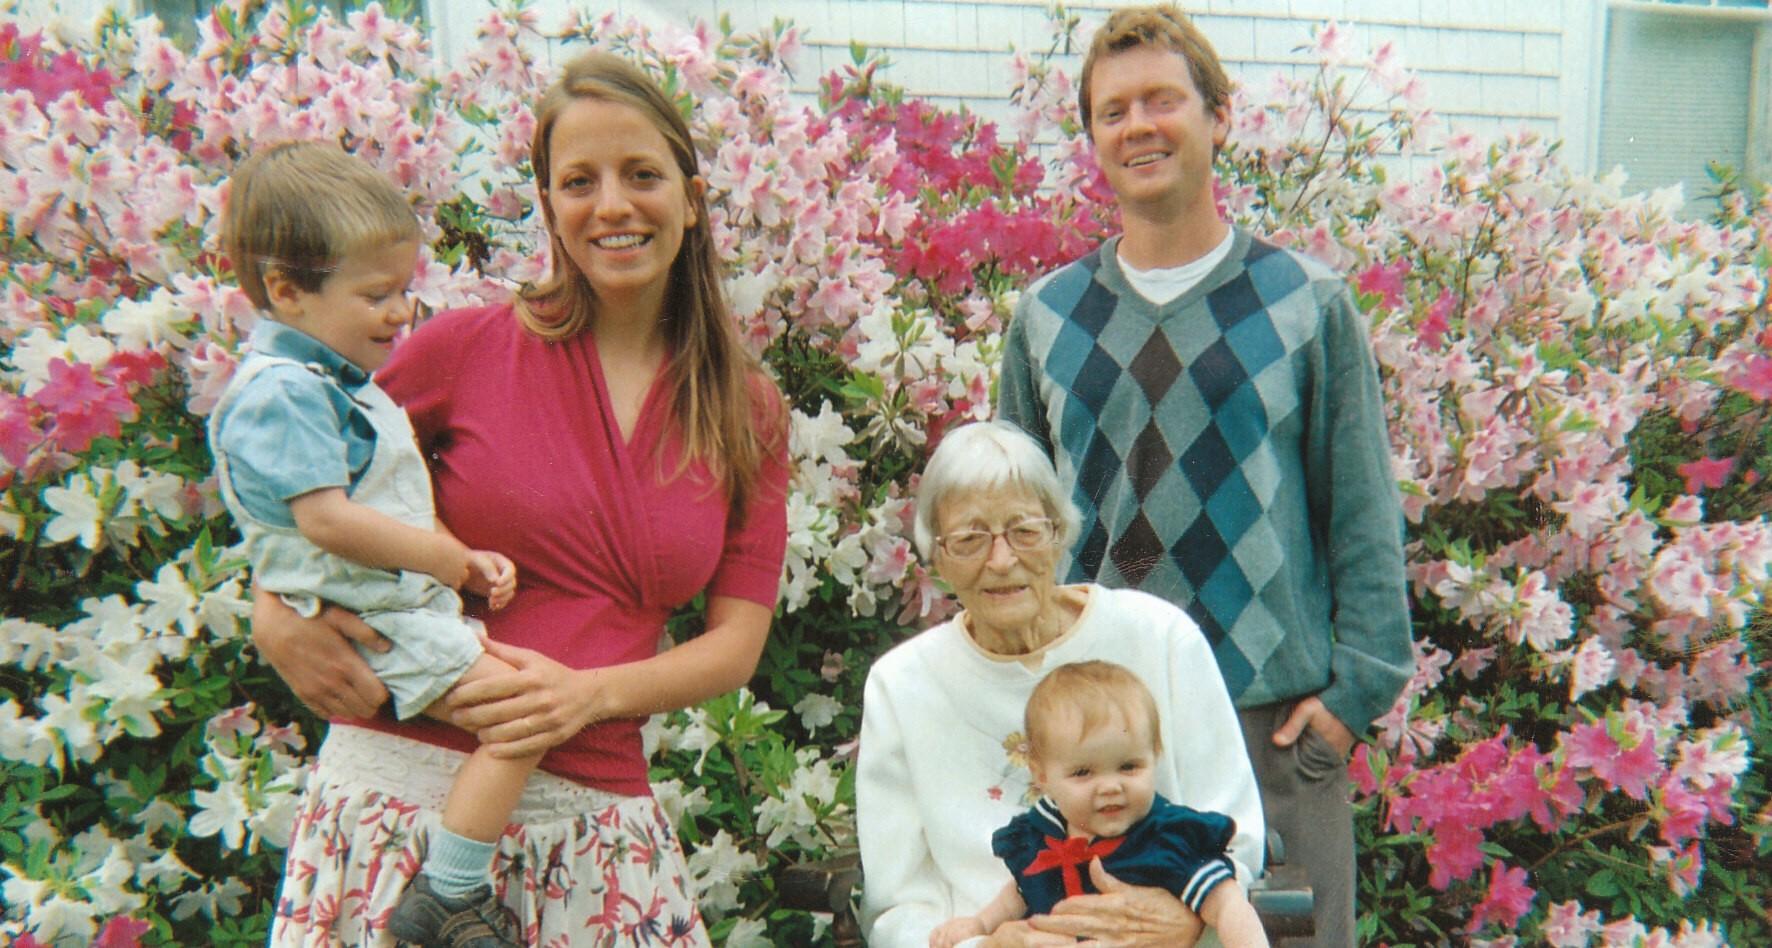 Winstead family, North Carolina